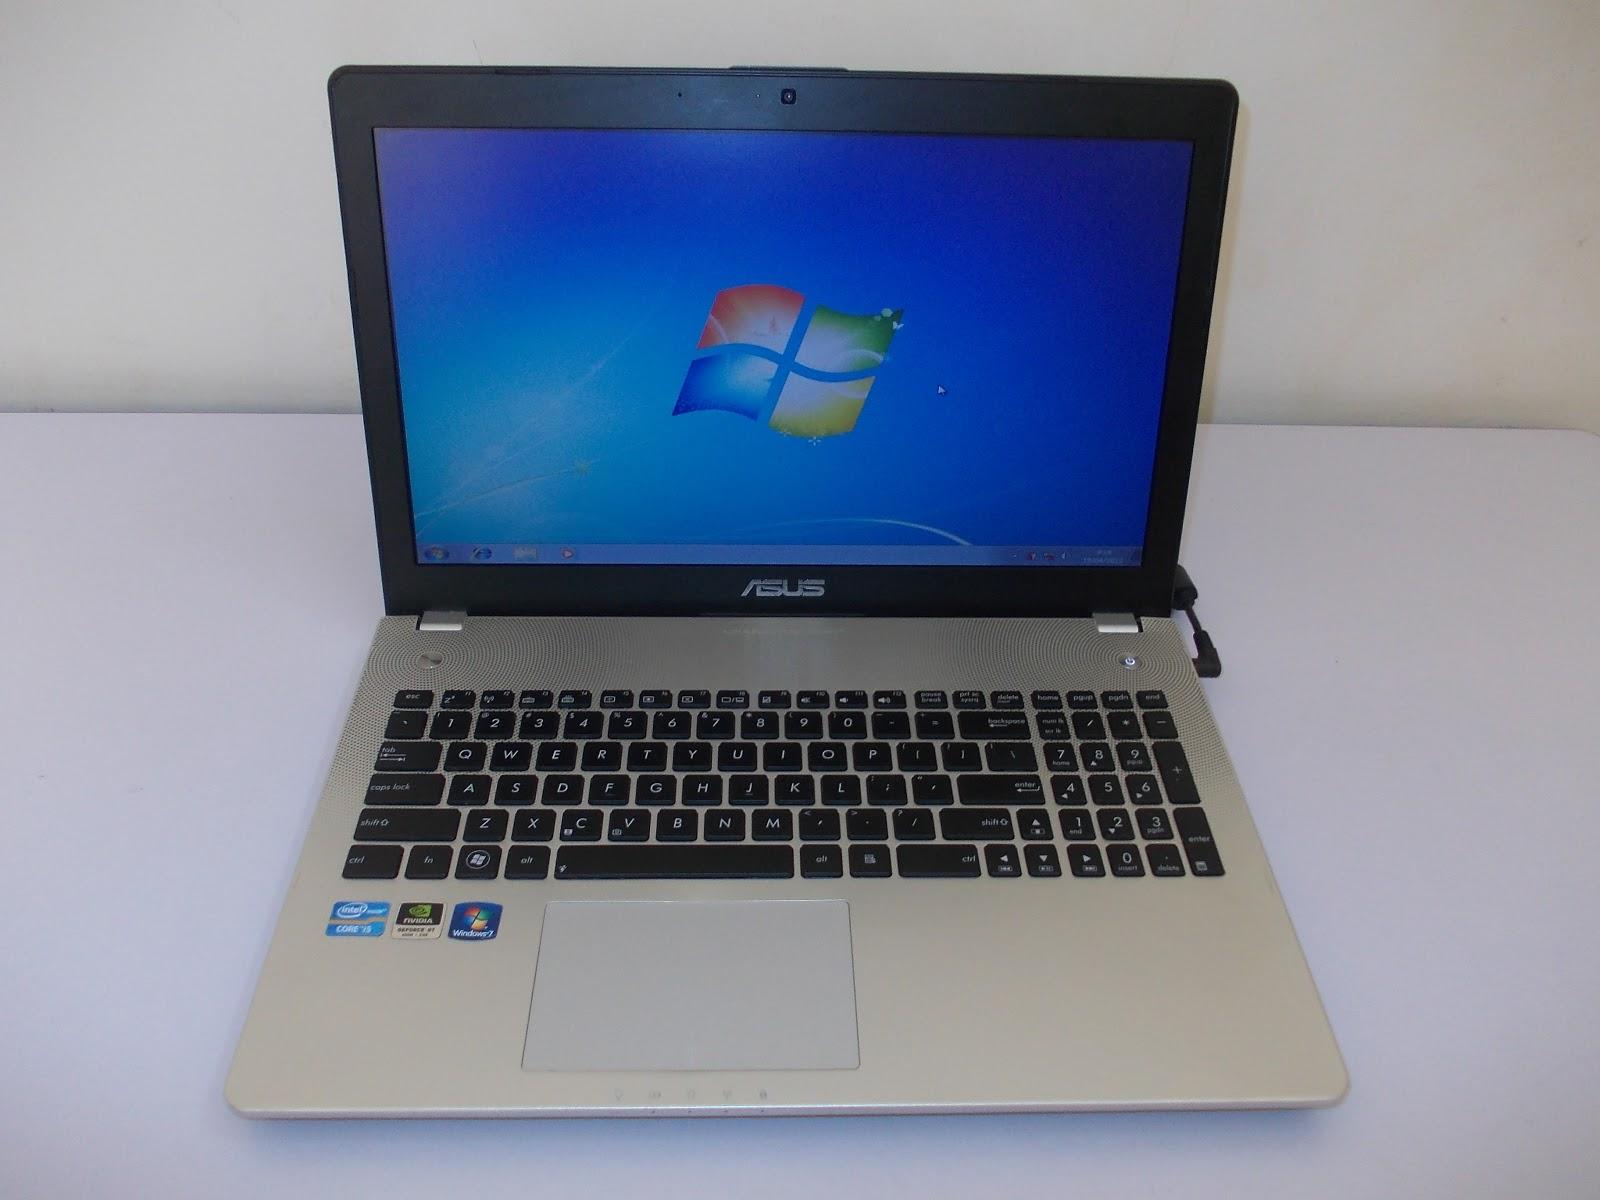 ASUS N56V: laptop specifications 46